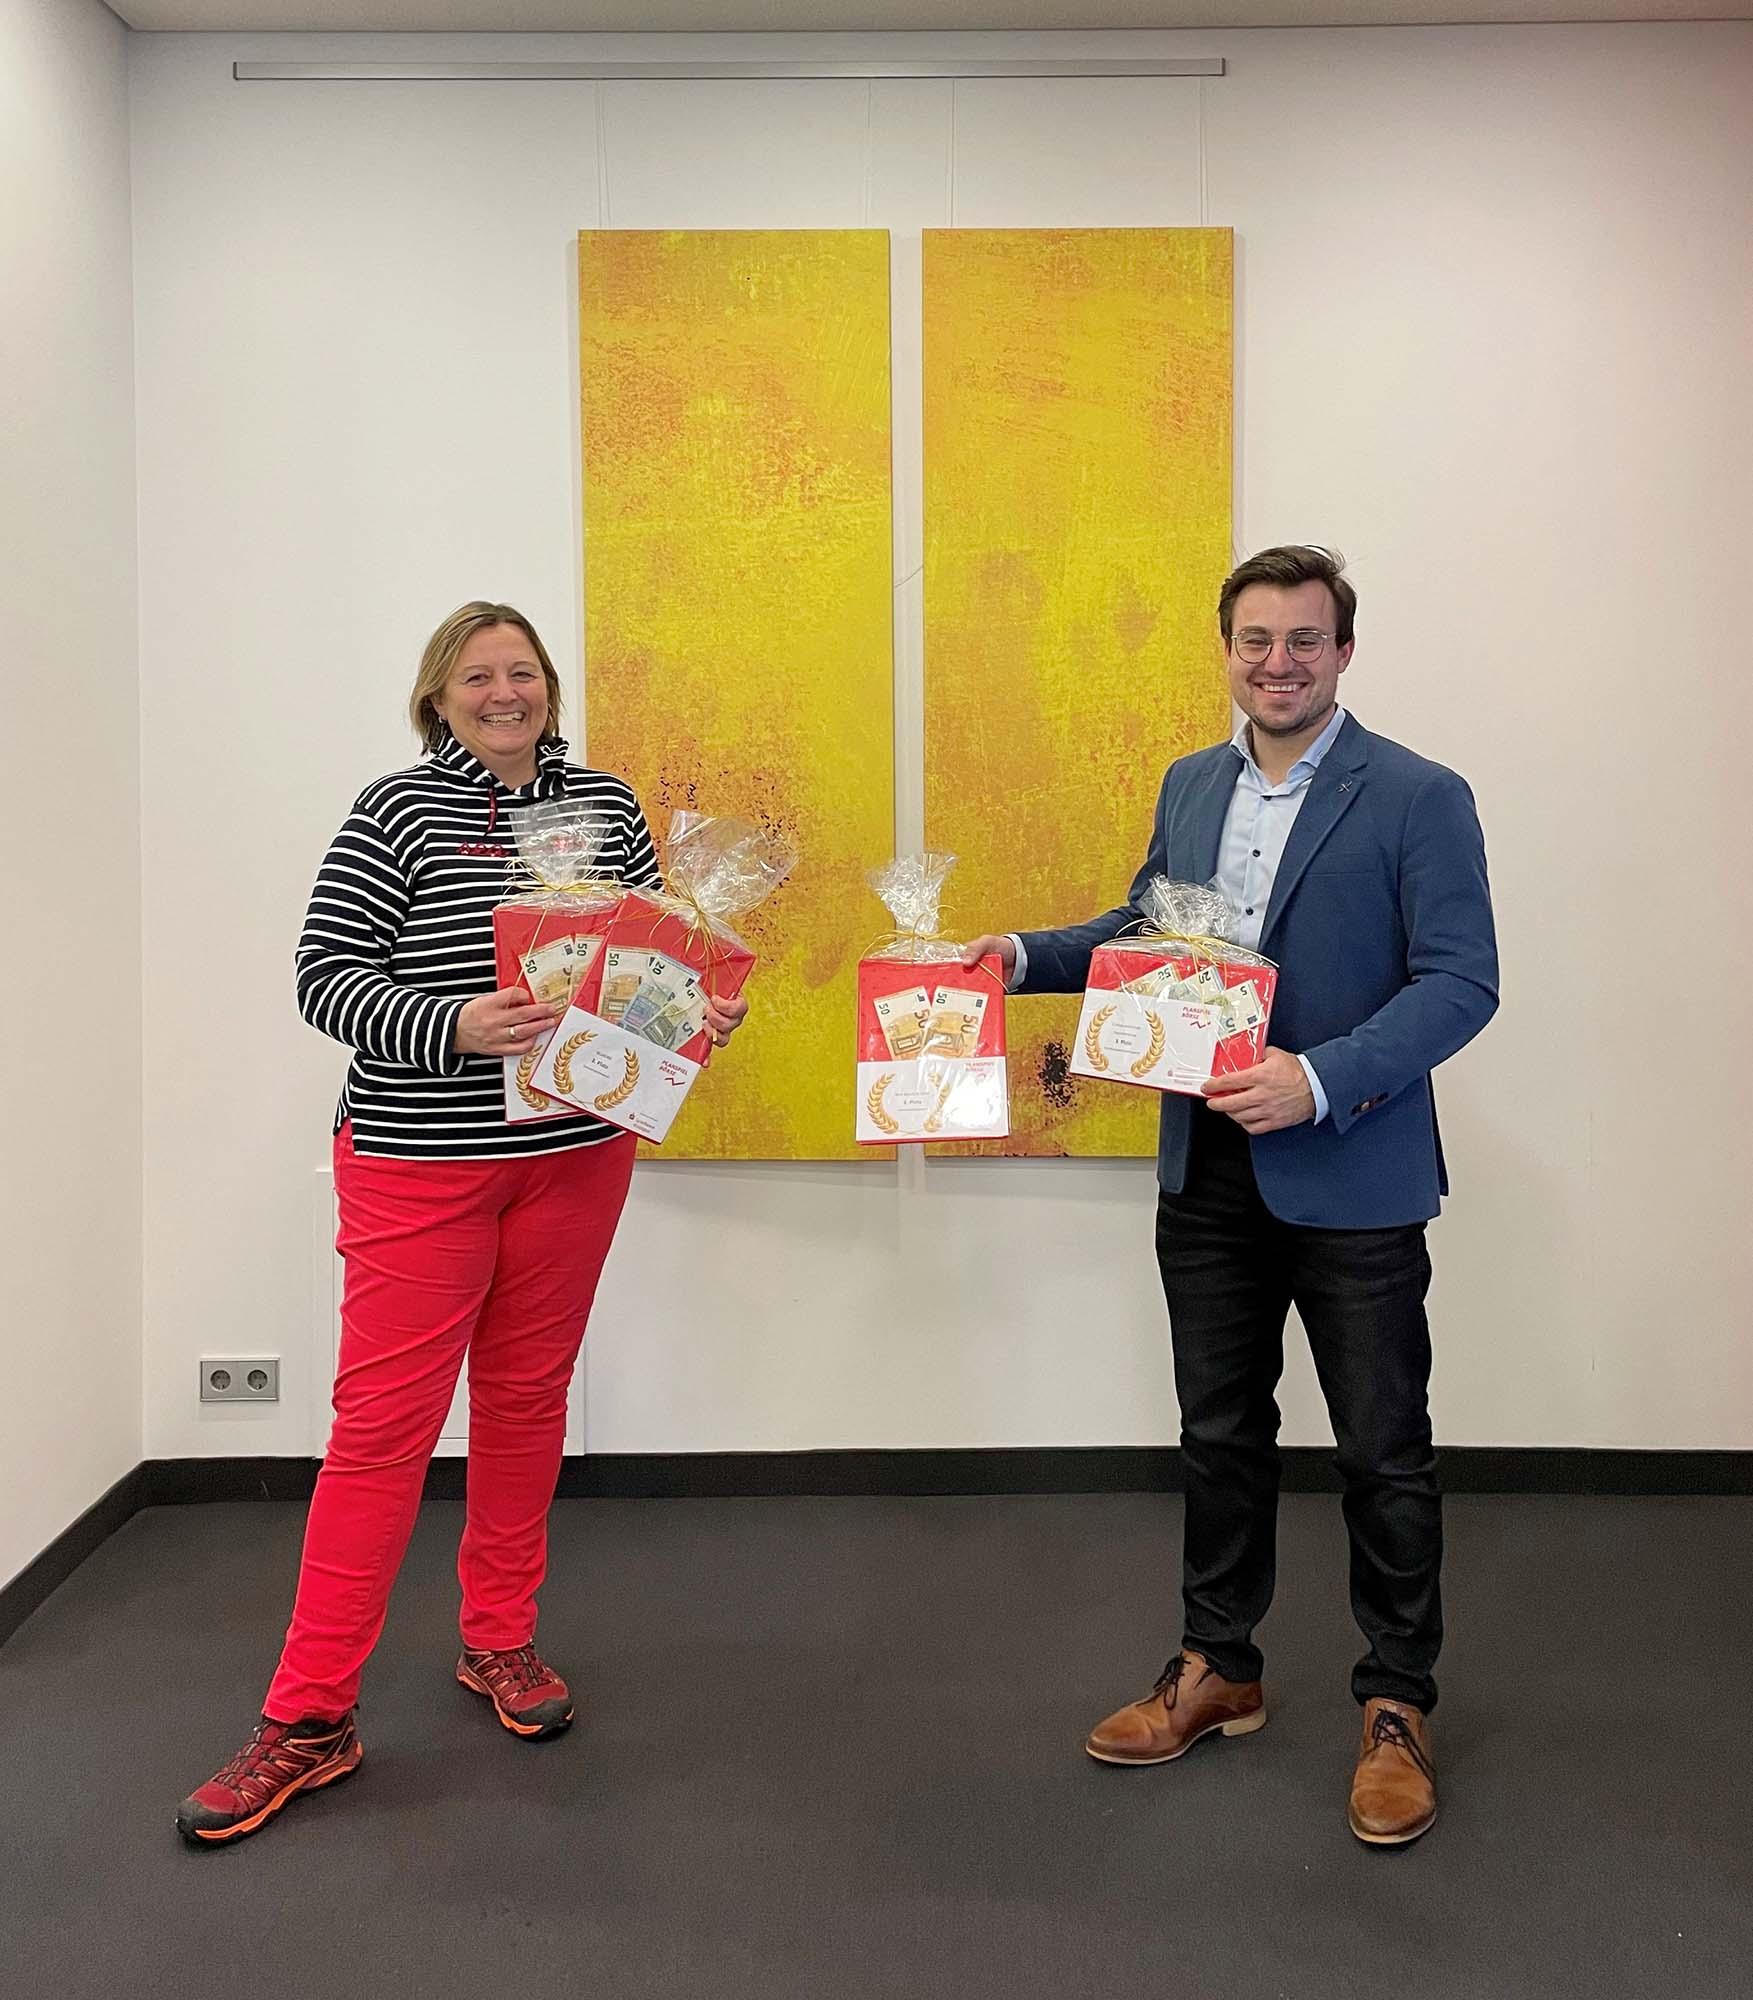 2021-3-3-Kinzigtal- Sparkasse Planspiel Börse- Sabine Kühn und Stefan Pfaff